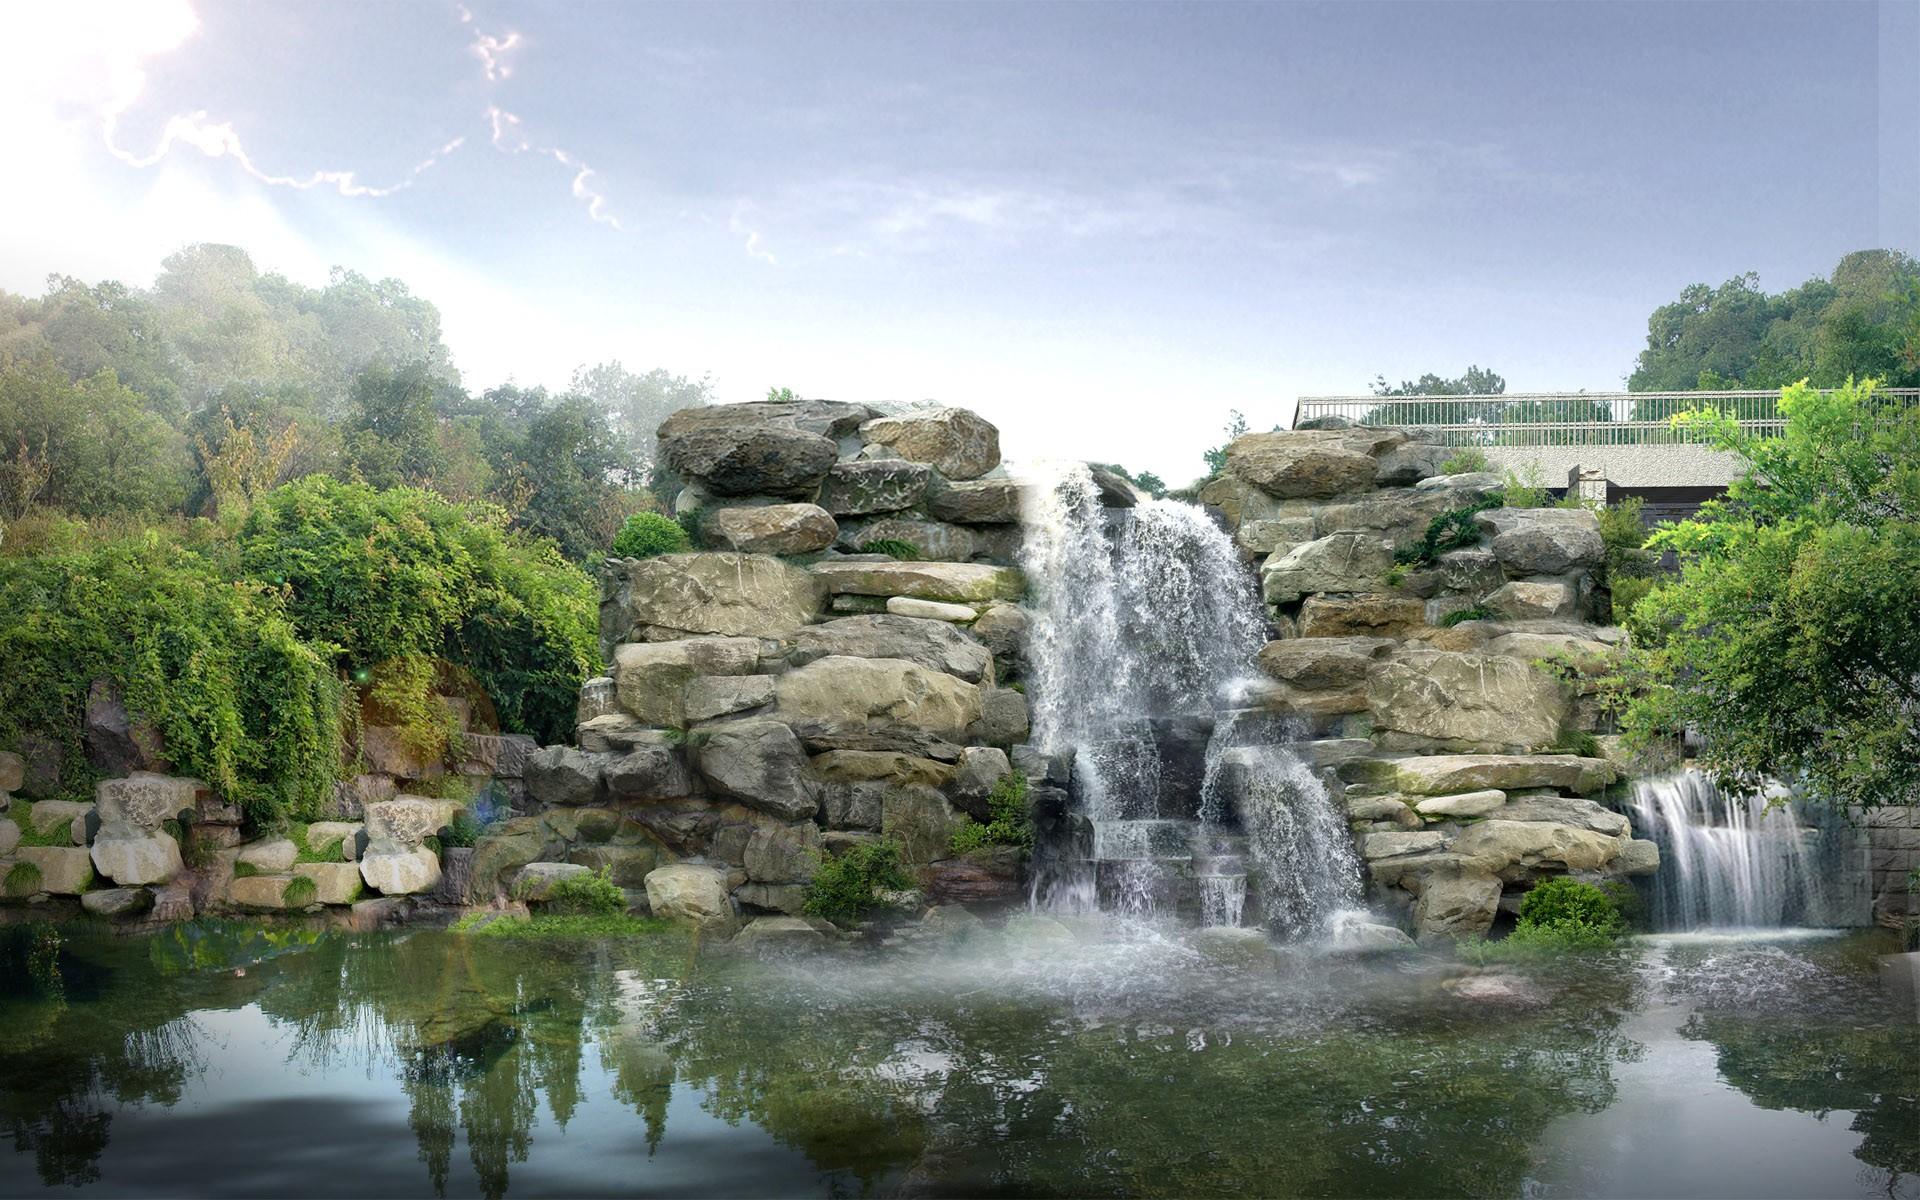 Japan Digital Waterfall Wallpapers HD Wallpapers 1920x1200